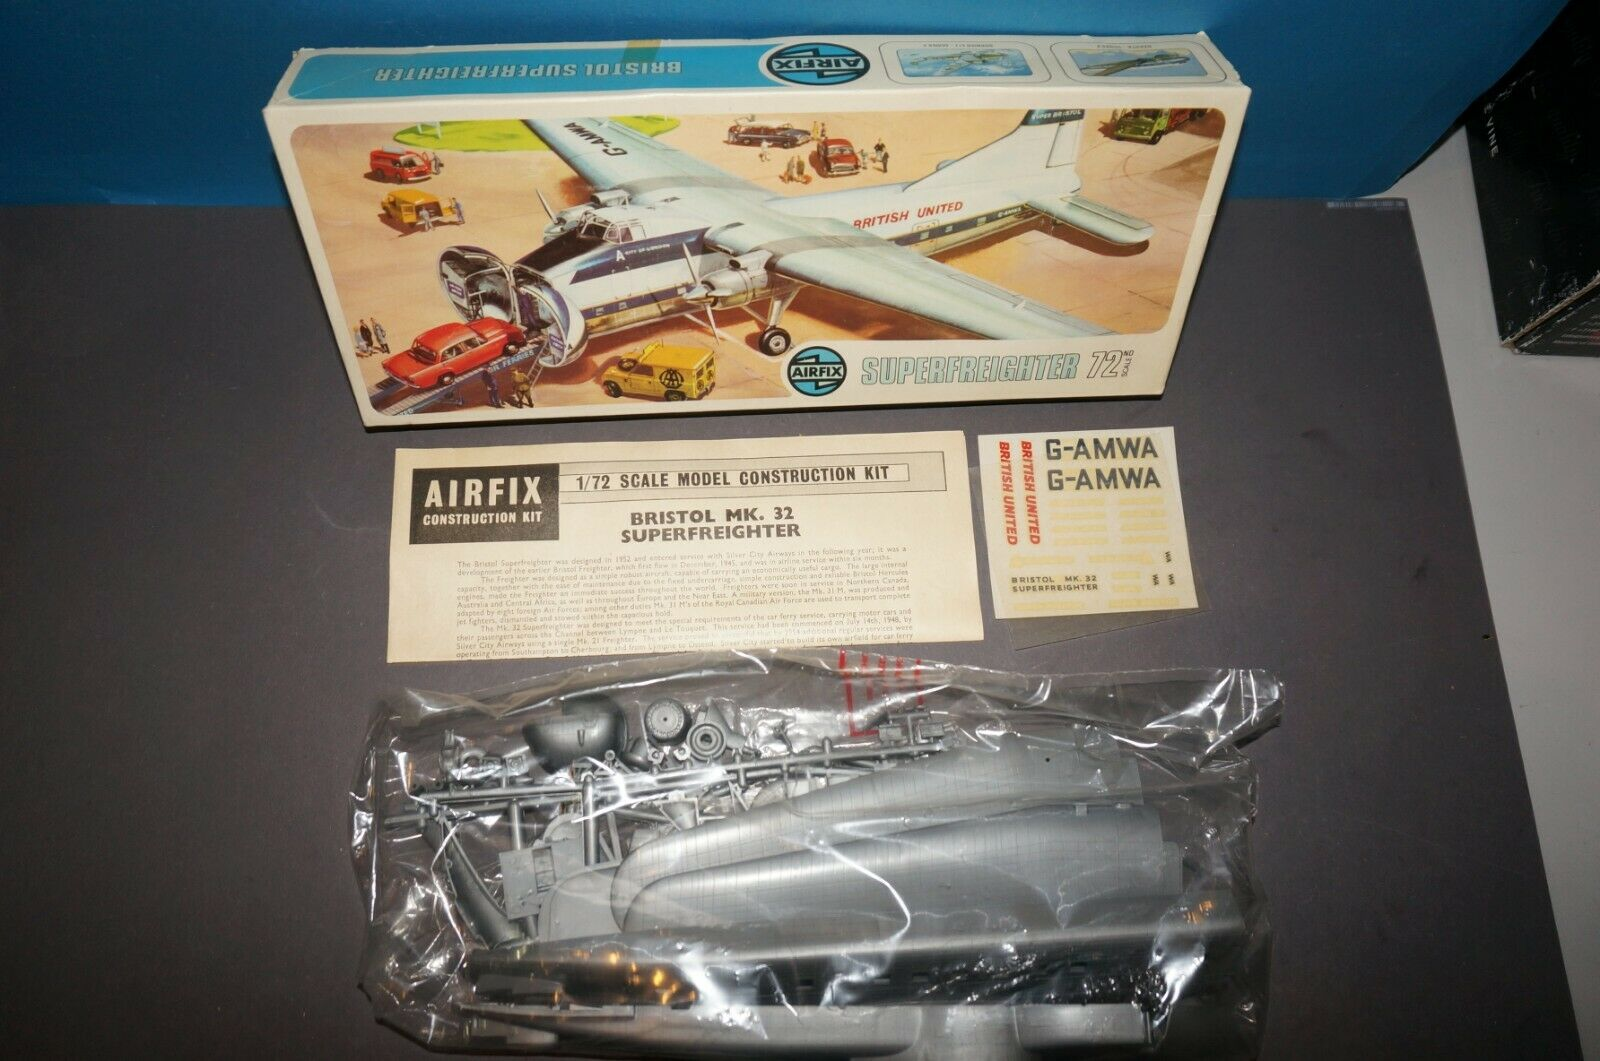 Rf C] airfix 05002-1 - Bristol mk 32 superfreighter - 1 72 - aircraft kit